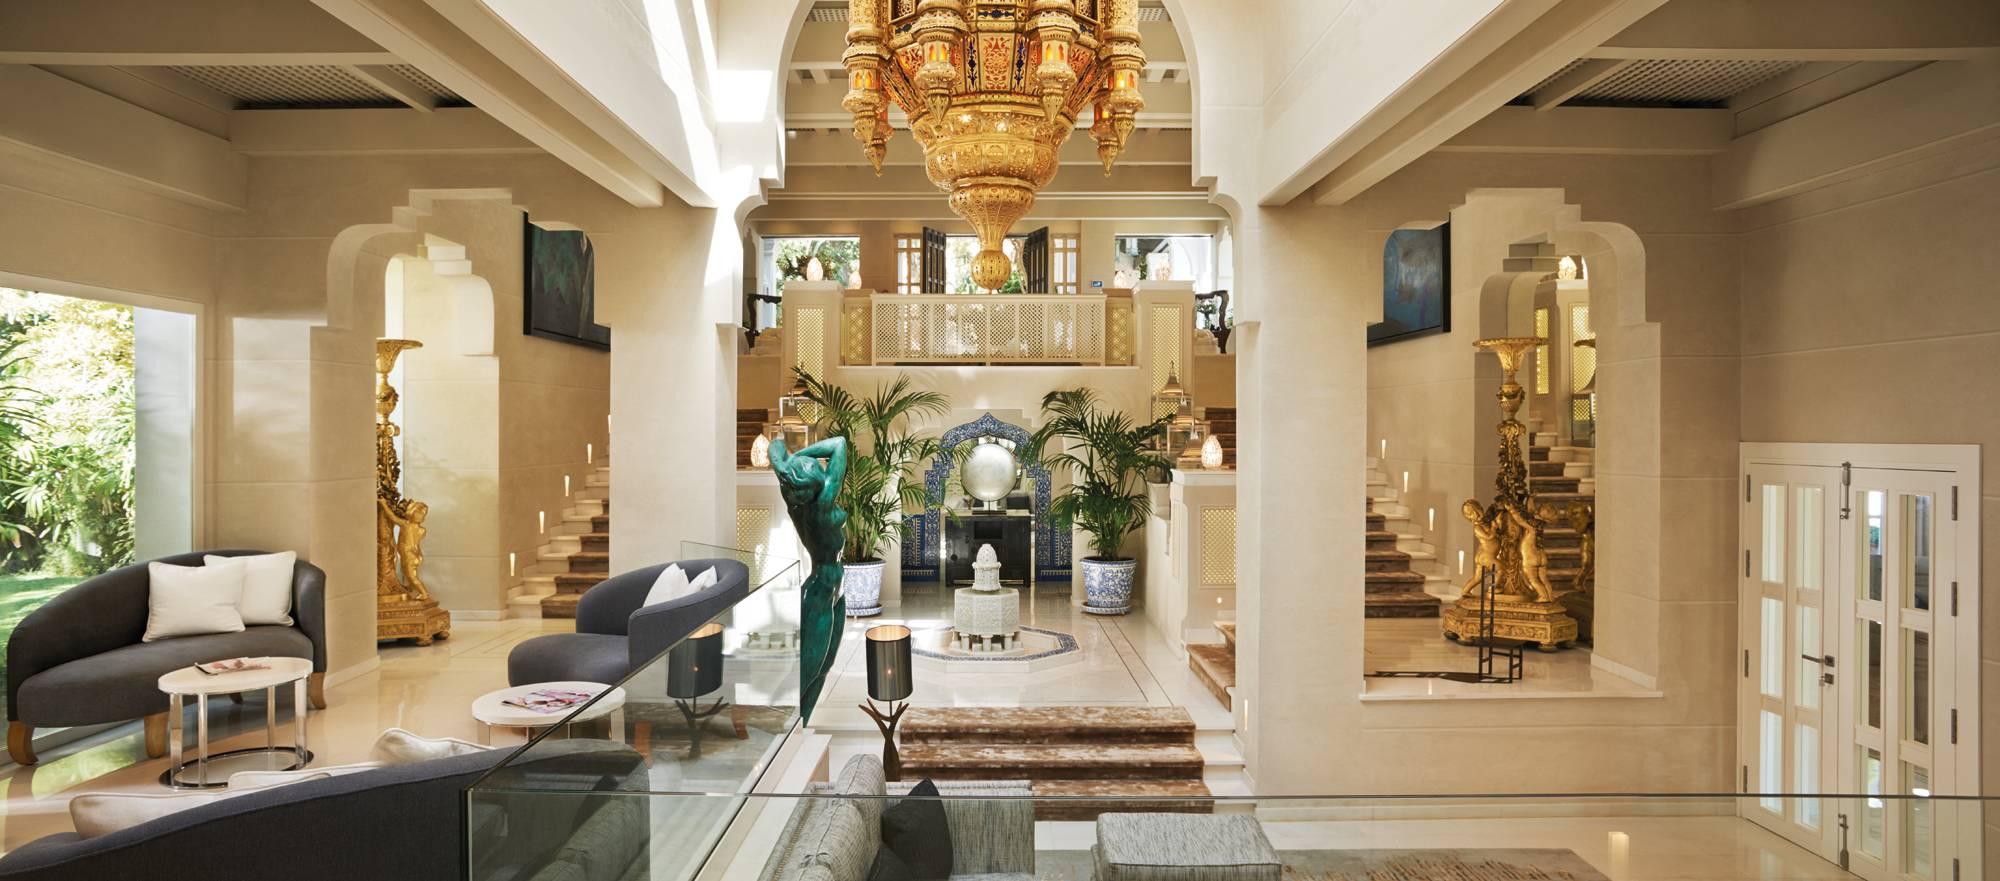 Marbella Club Villa del Mar - Entrance Inside